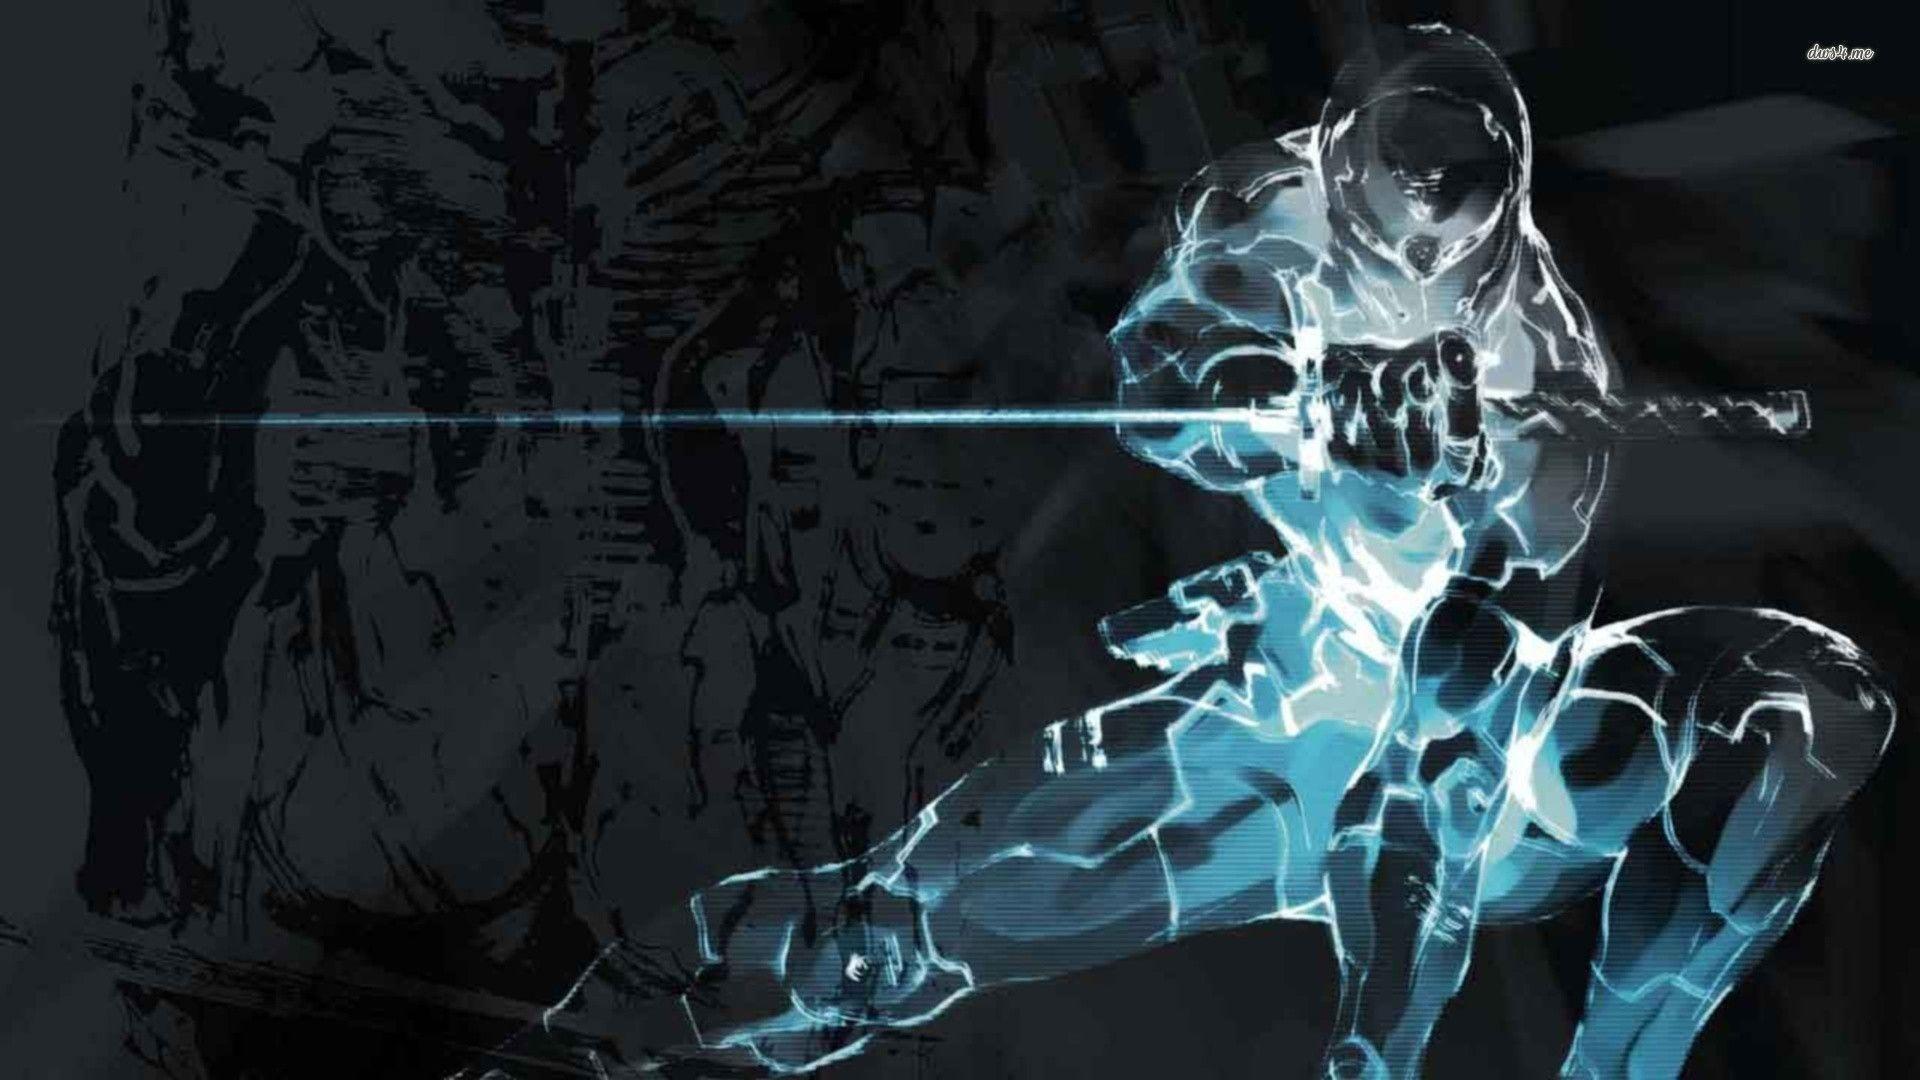 Wallpapertags – Metal Gear Solid HD Tablet Smartphone Wallpaper #